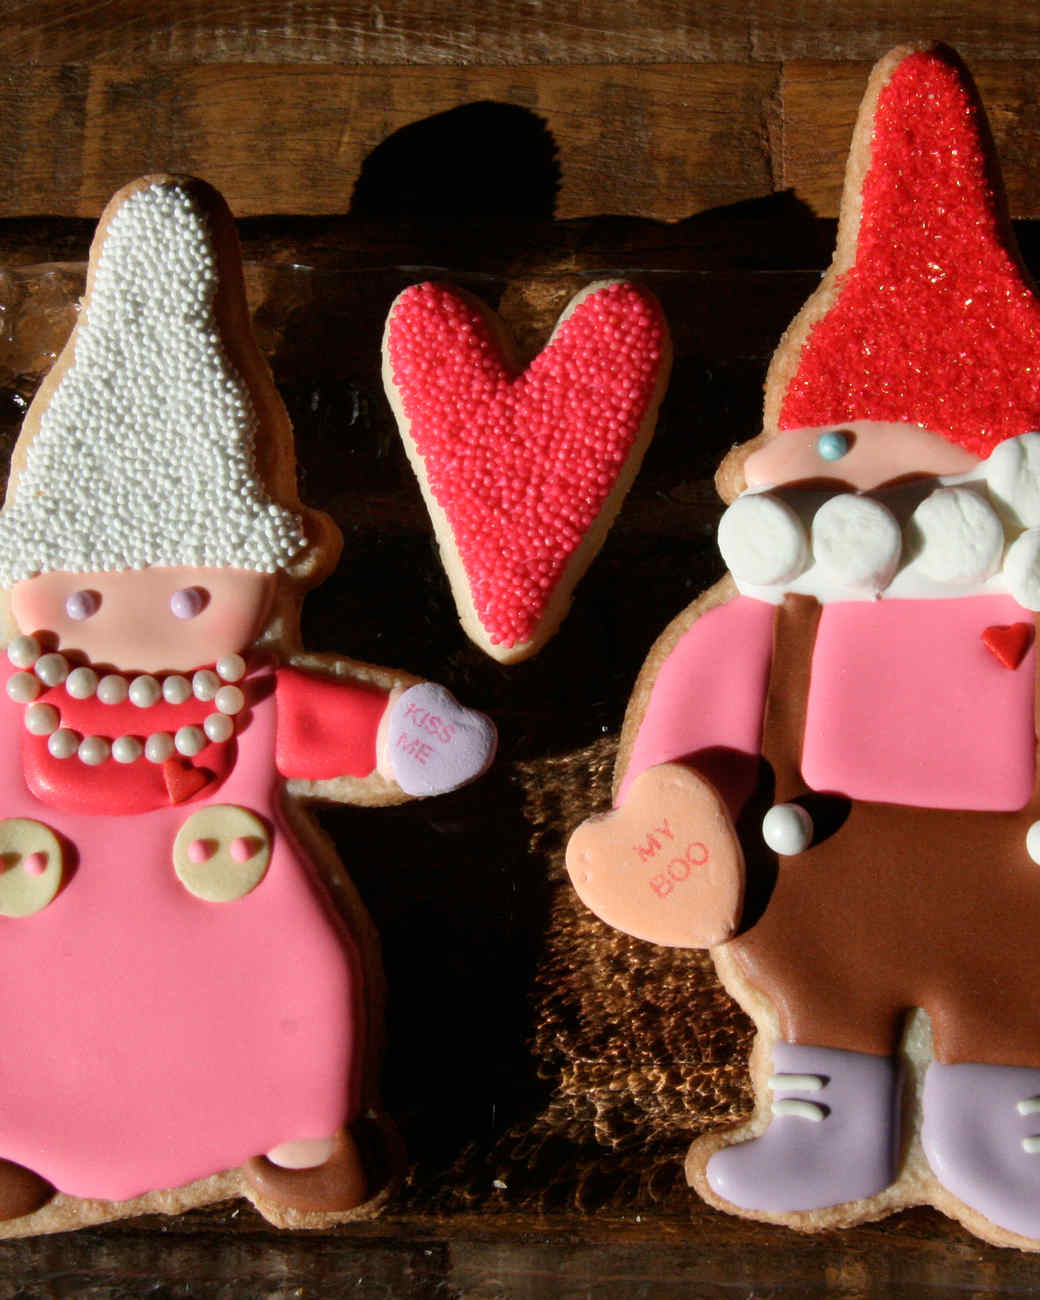 gnome-cookie-mslb7082.jpg